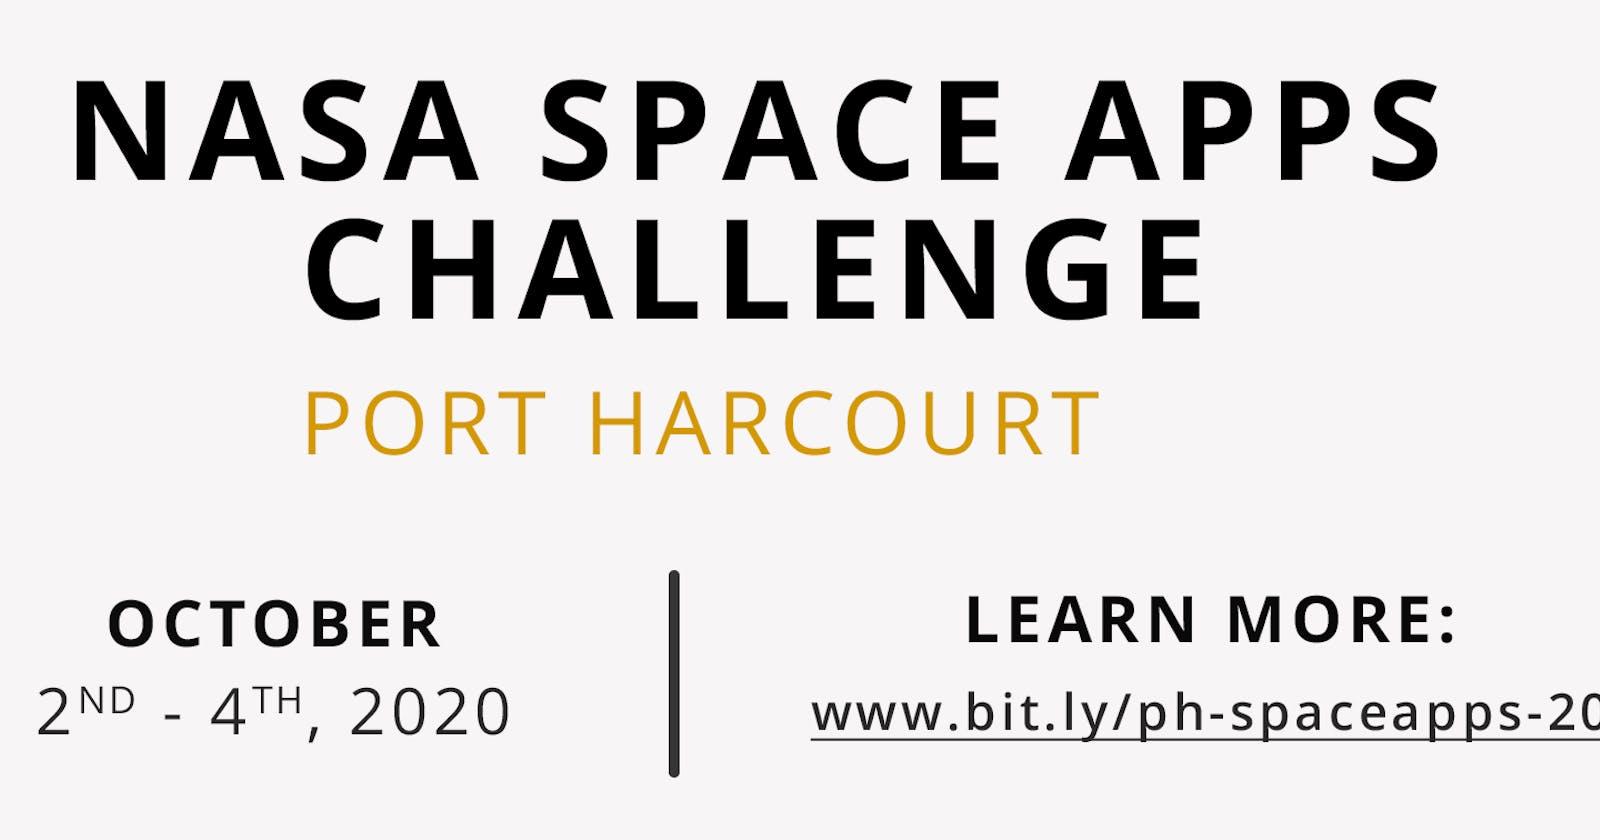 Report on NASA Space Apps Challenge Port Harcourt 2020 Hackathon -- Port Harcourt School of AI.